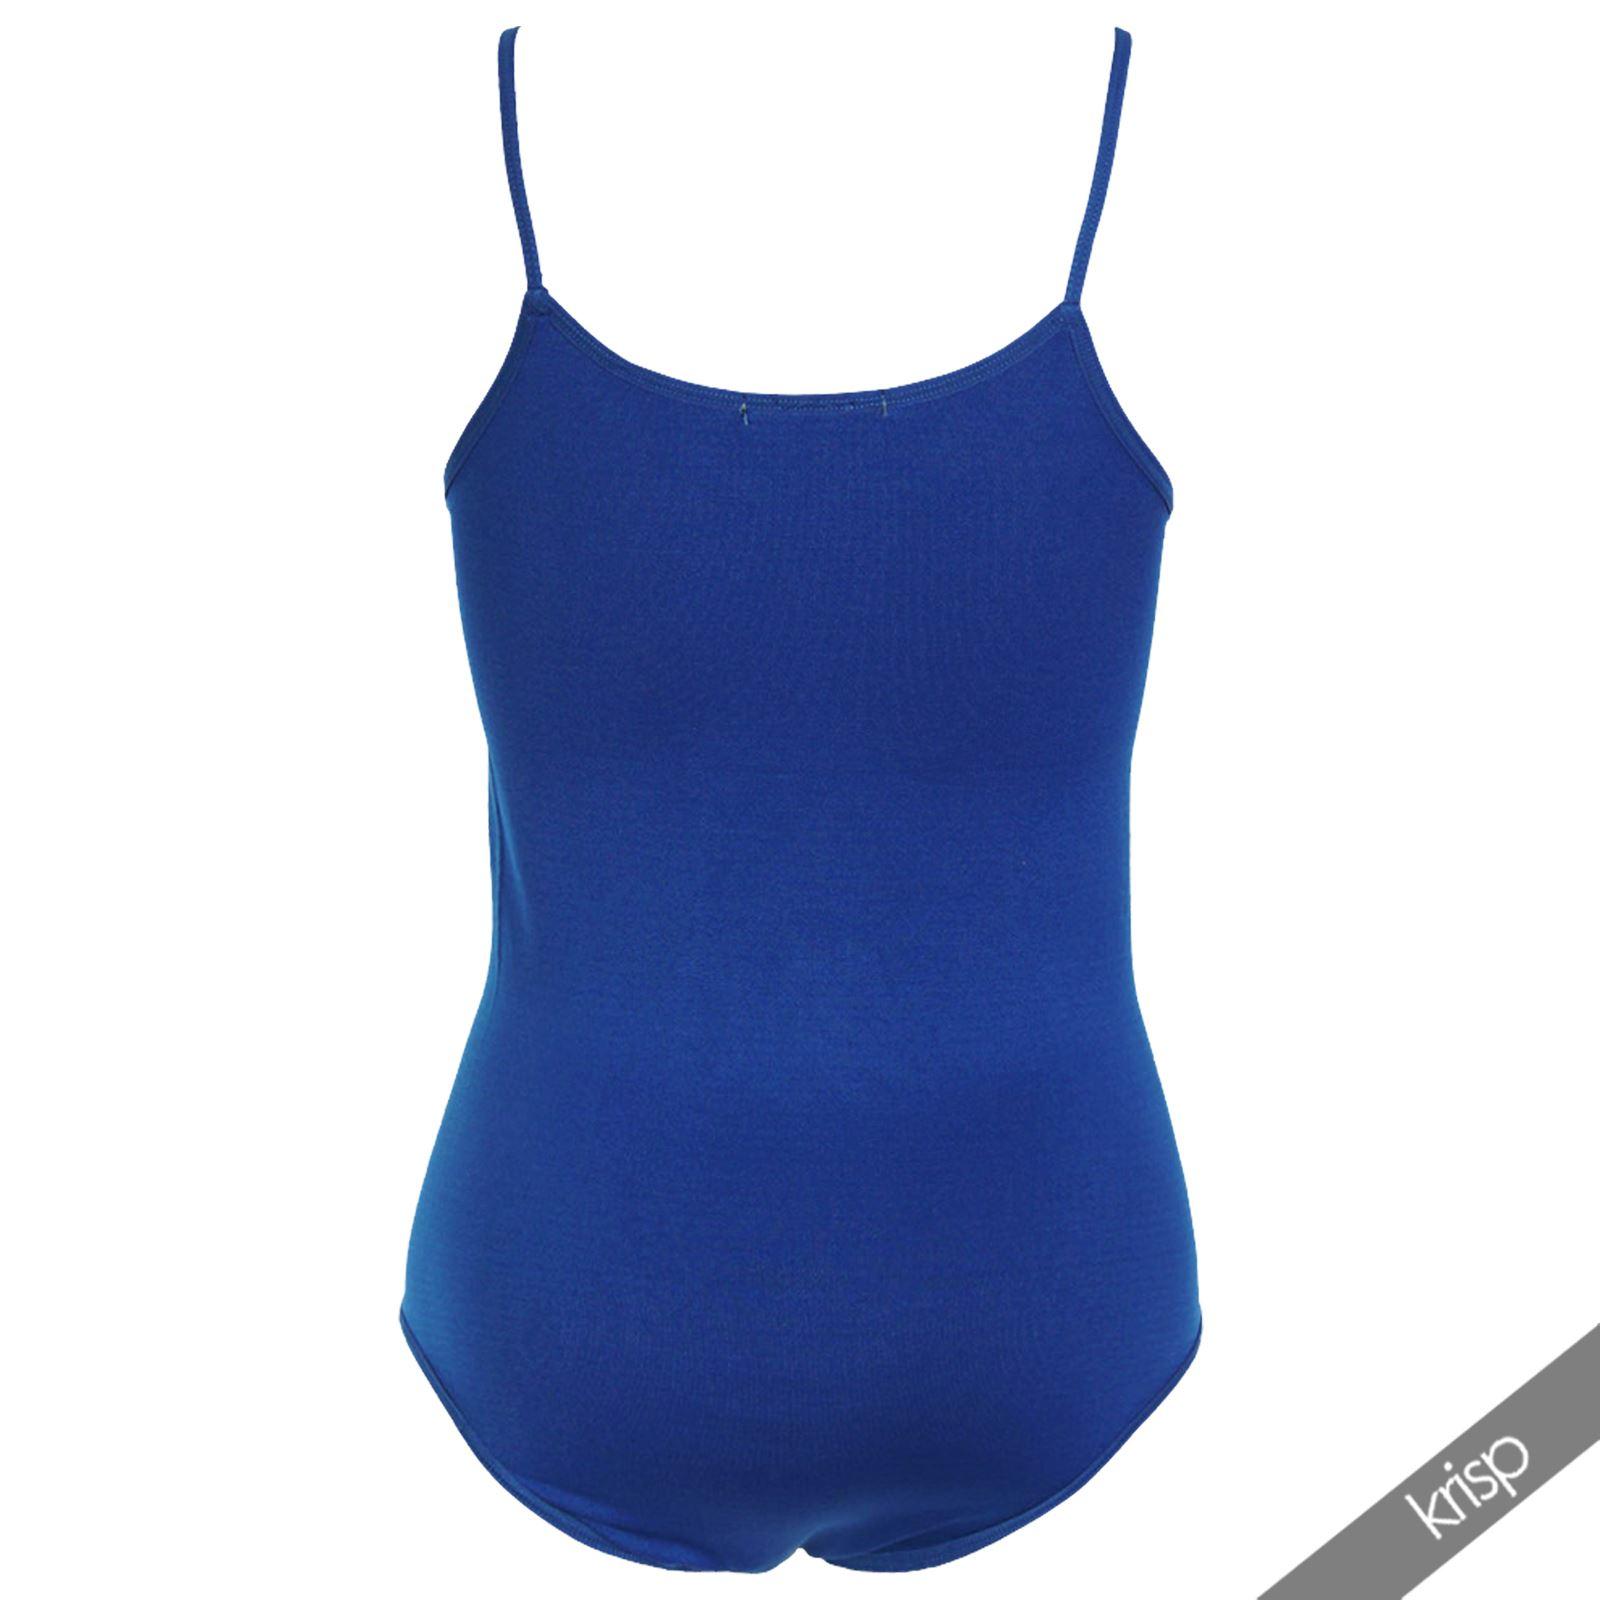 Body-Mujer-Basico-Invierno-Cuello-Barato-Top-Camiseta-Ajustado-Tirantes-Elastico miniatura 21